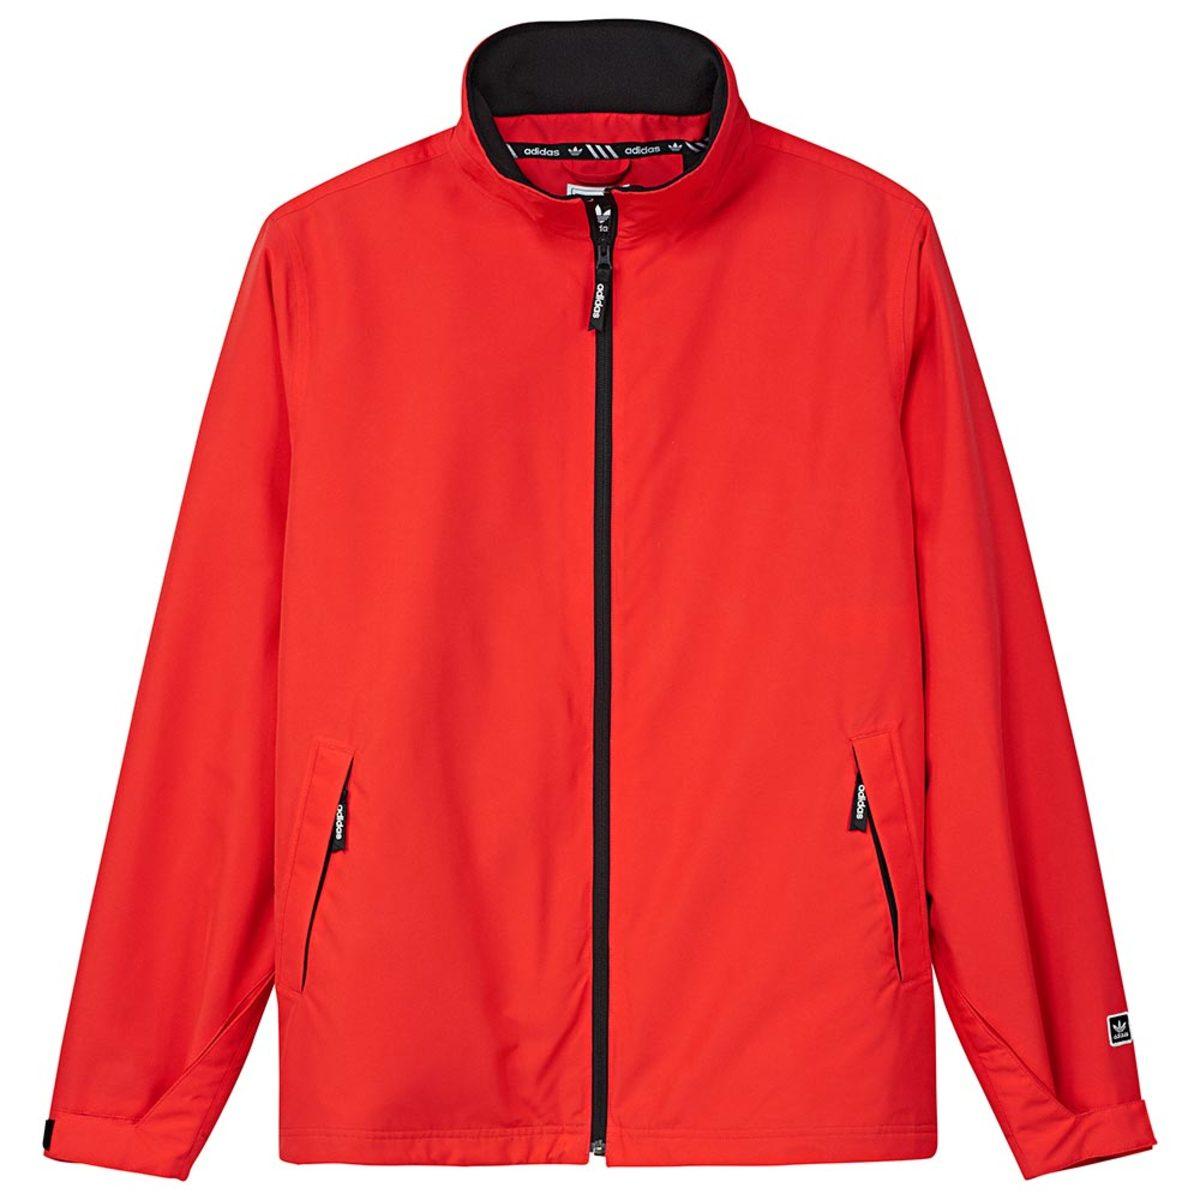 Adidas Mens 2019 Snowboarding Snow Civilian Jacket Hi Res Red Black Coats Jackets